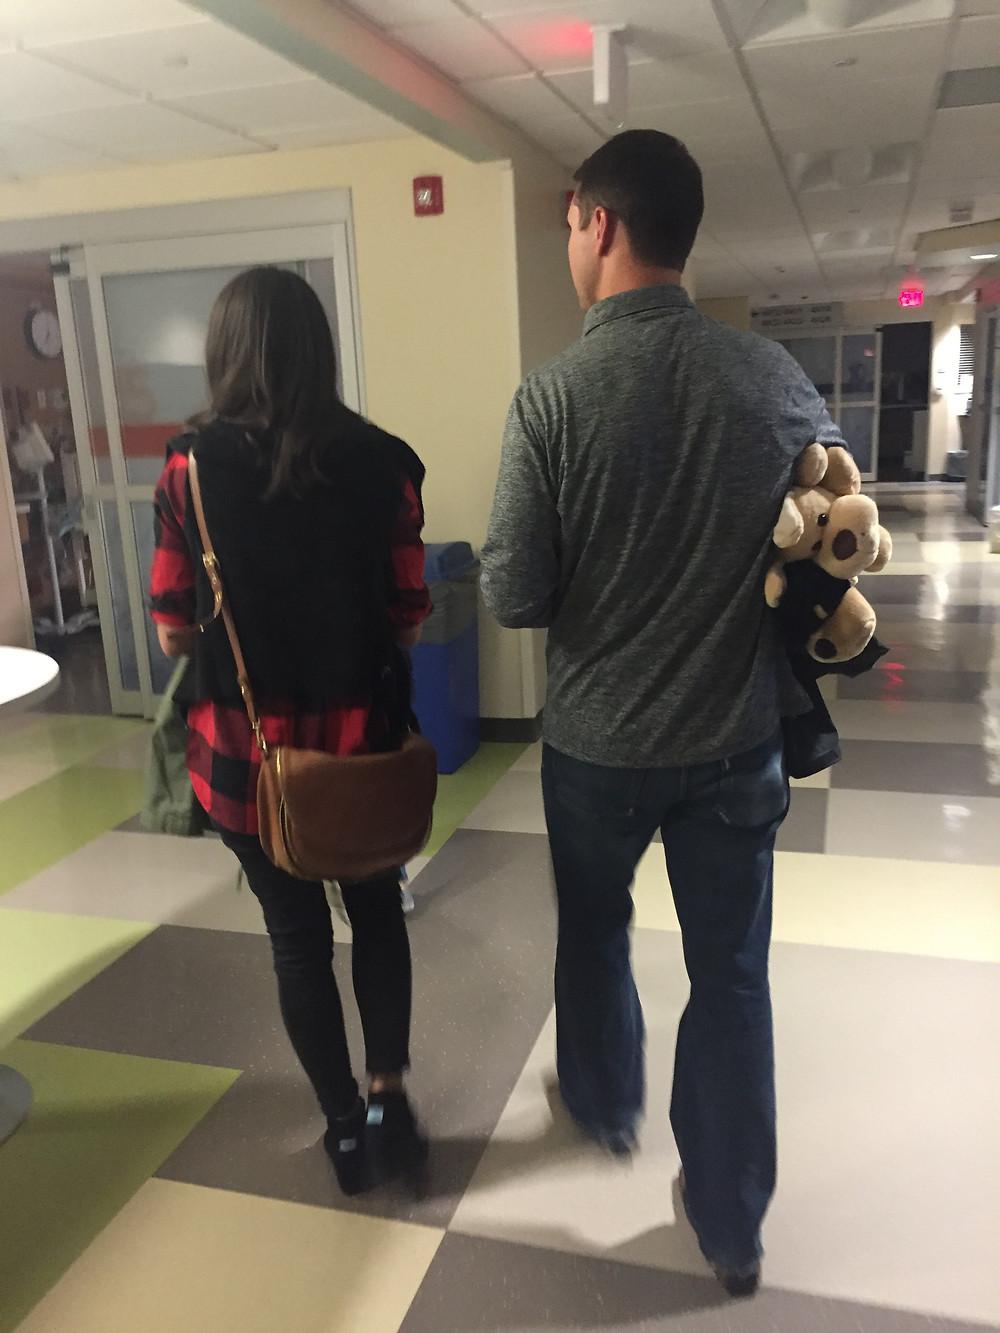 Walking down the hospital hallway